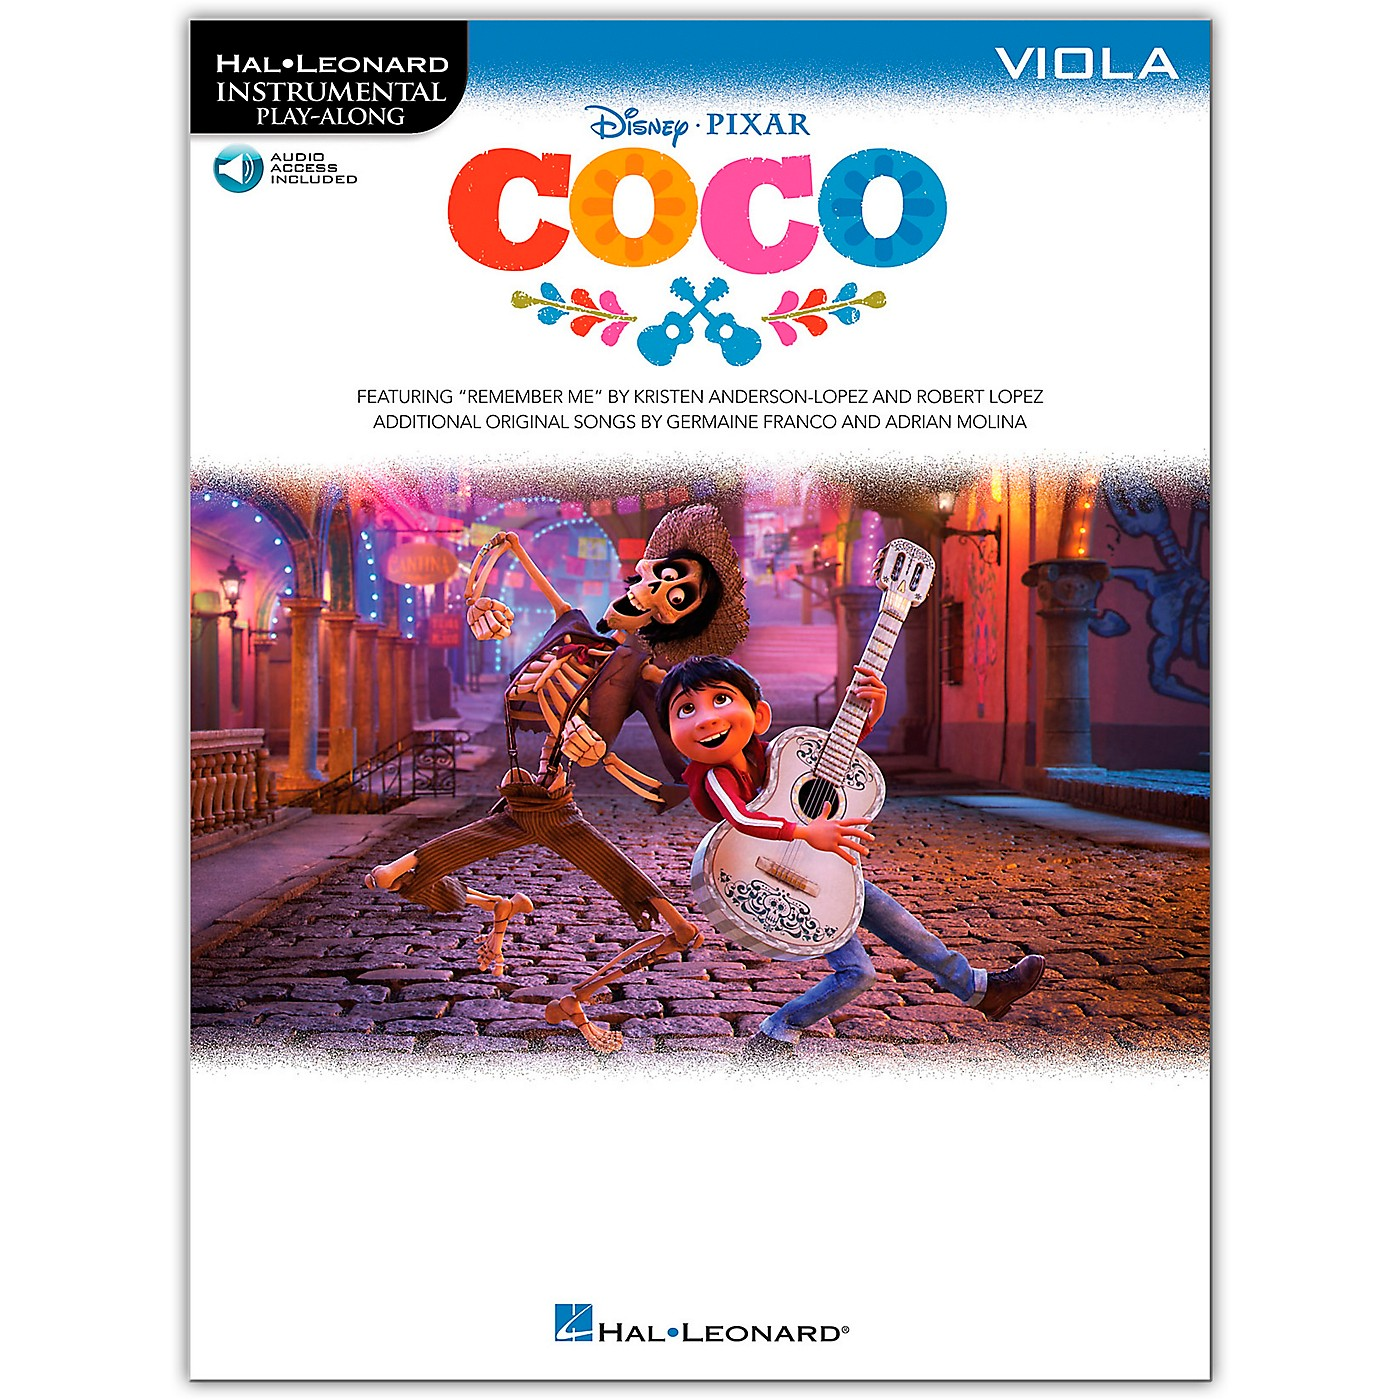 Hal Leonard Coco For Viola - Instrumental Play-Along (Book/Audio Online) thumbnail